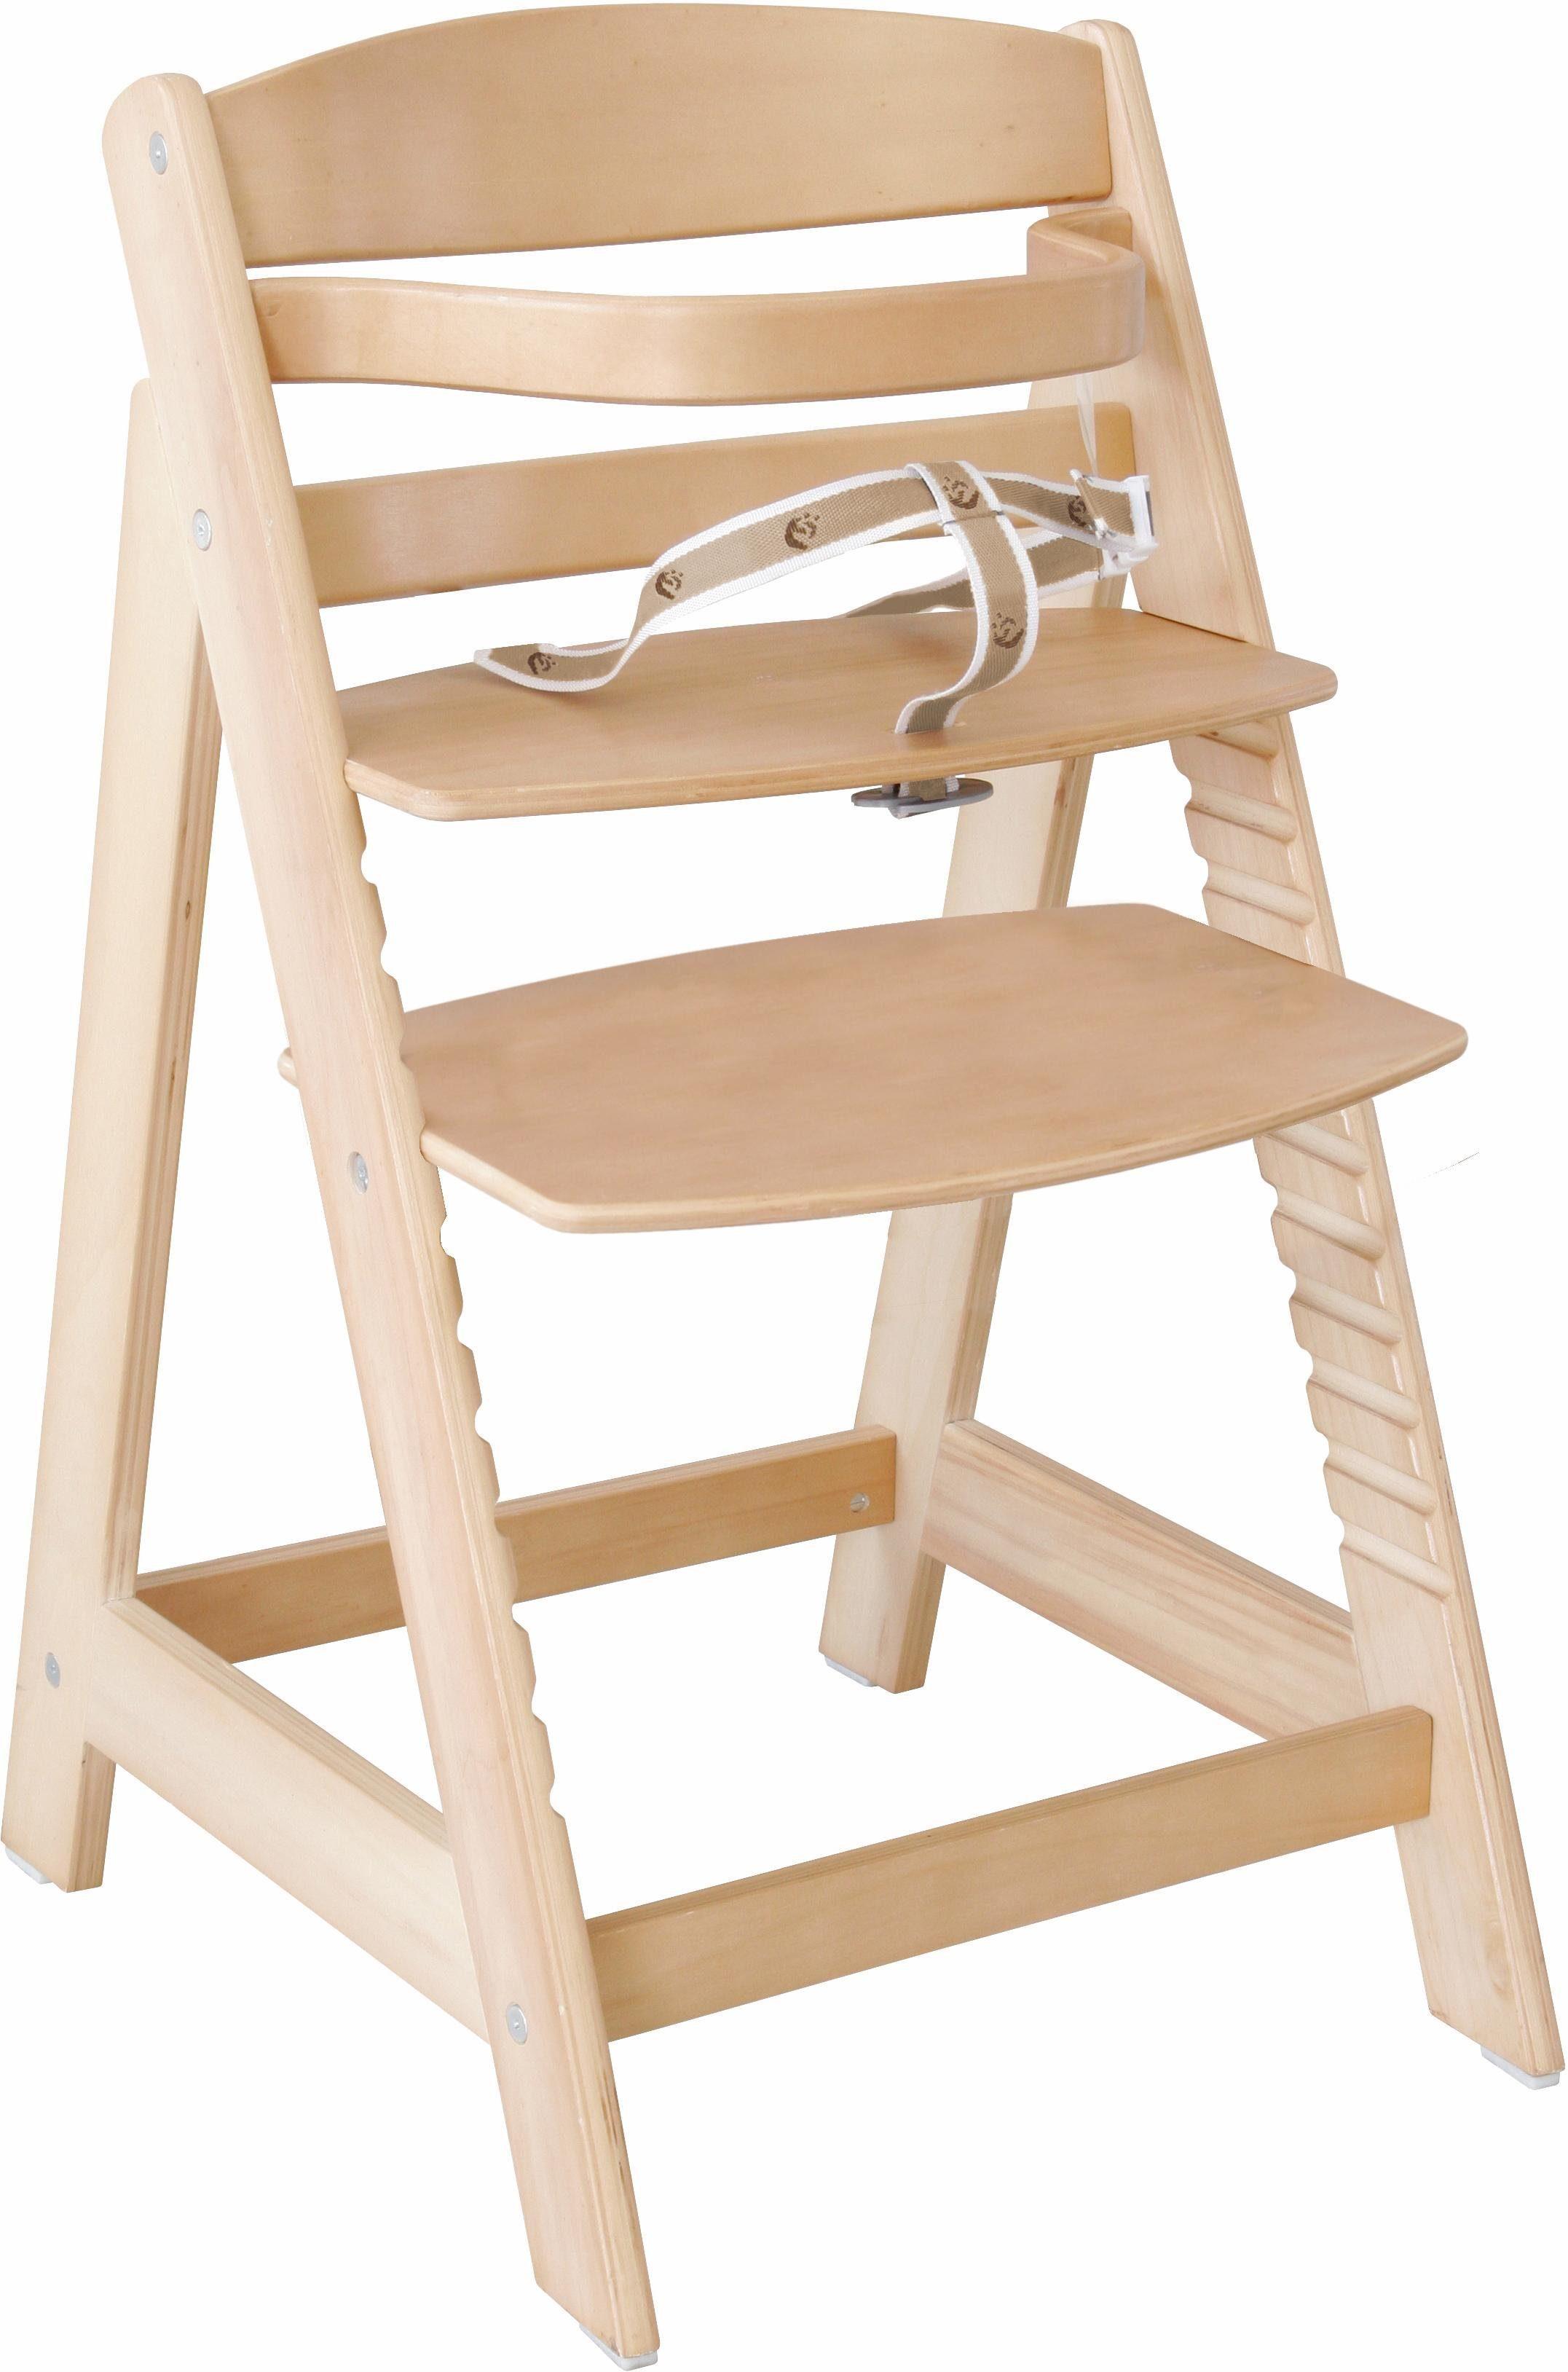 Roba Hochstuhl aus Holz, »Treppenhochstuhl Sit up III, natur«